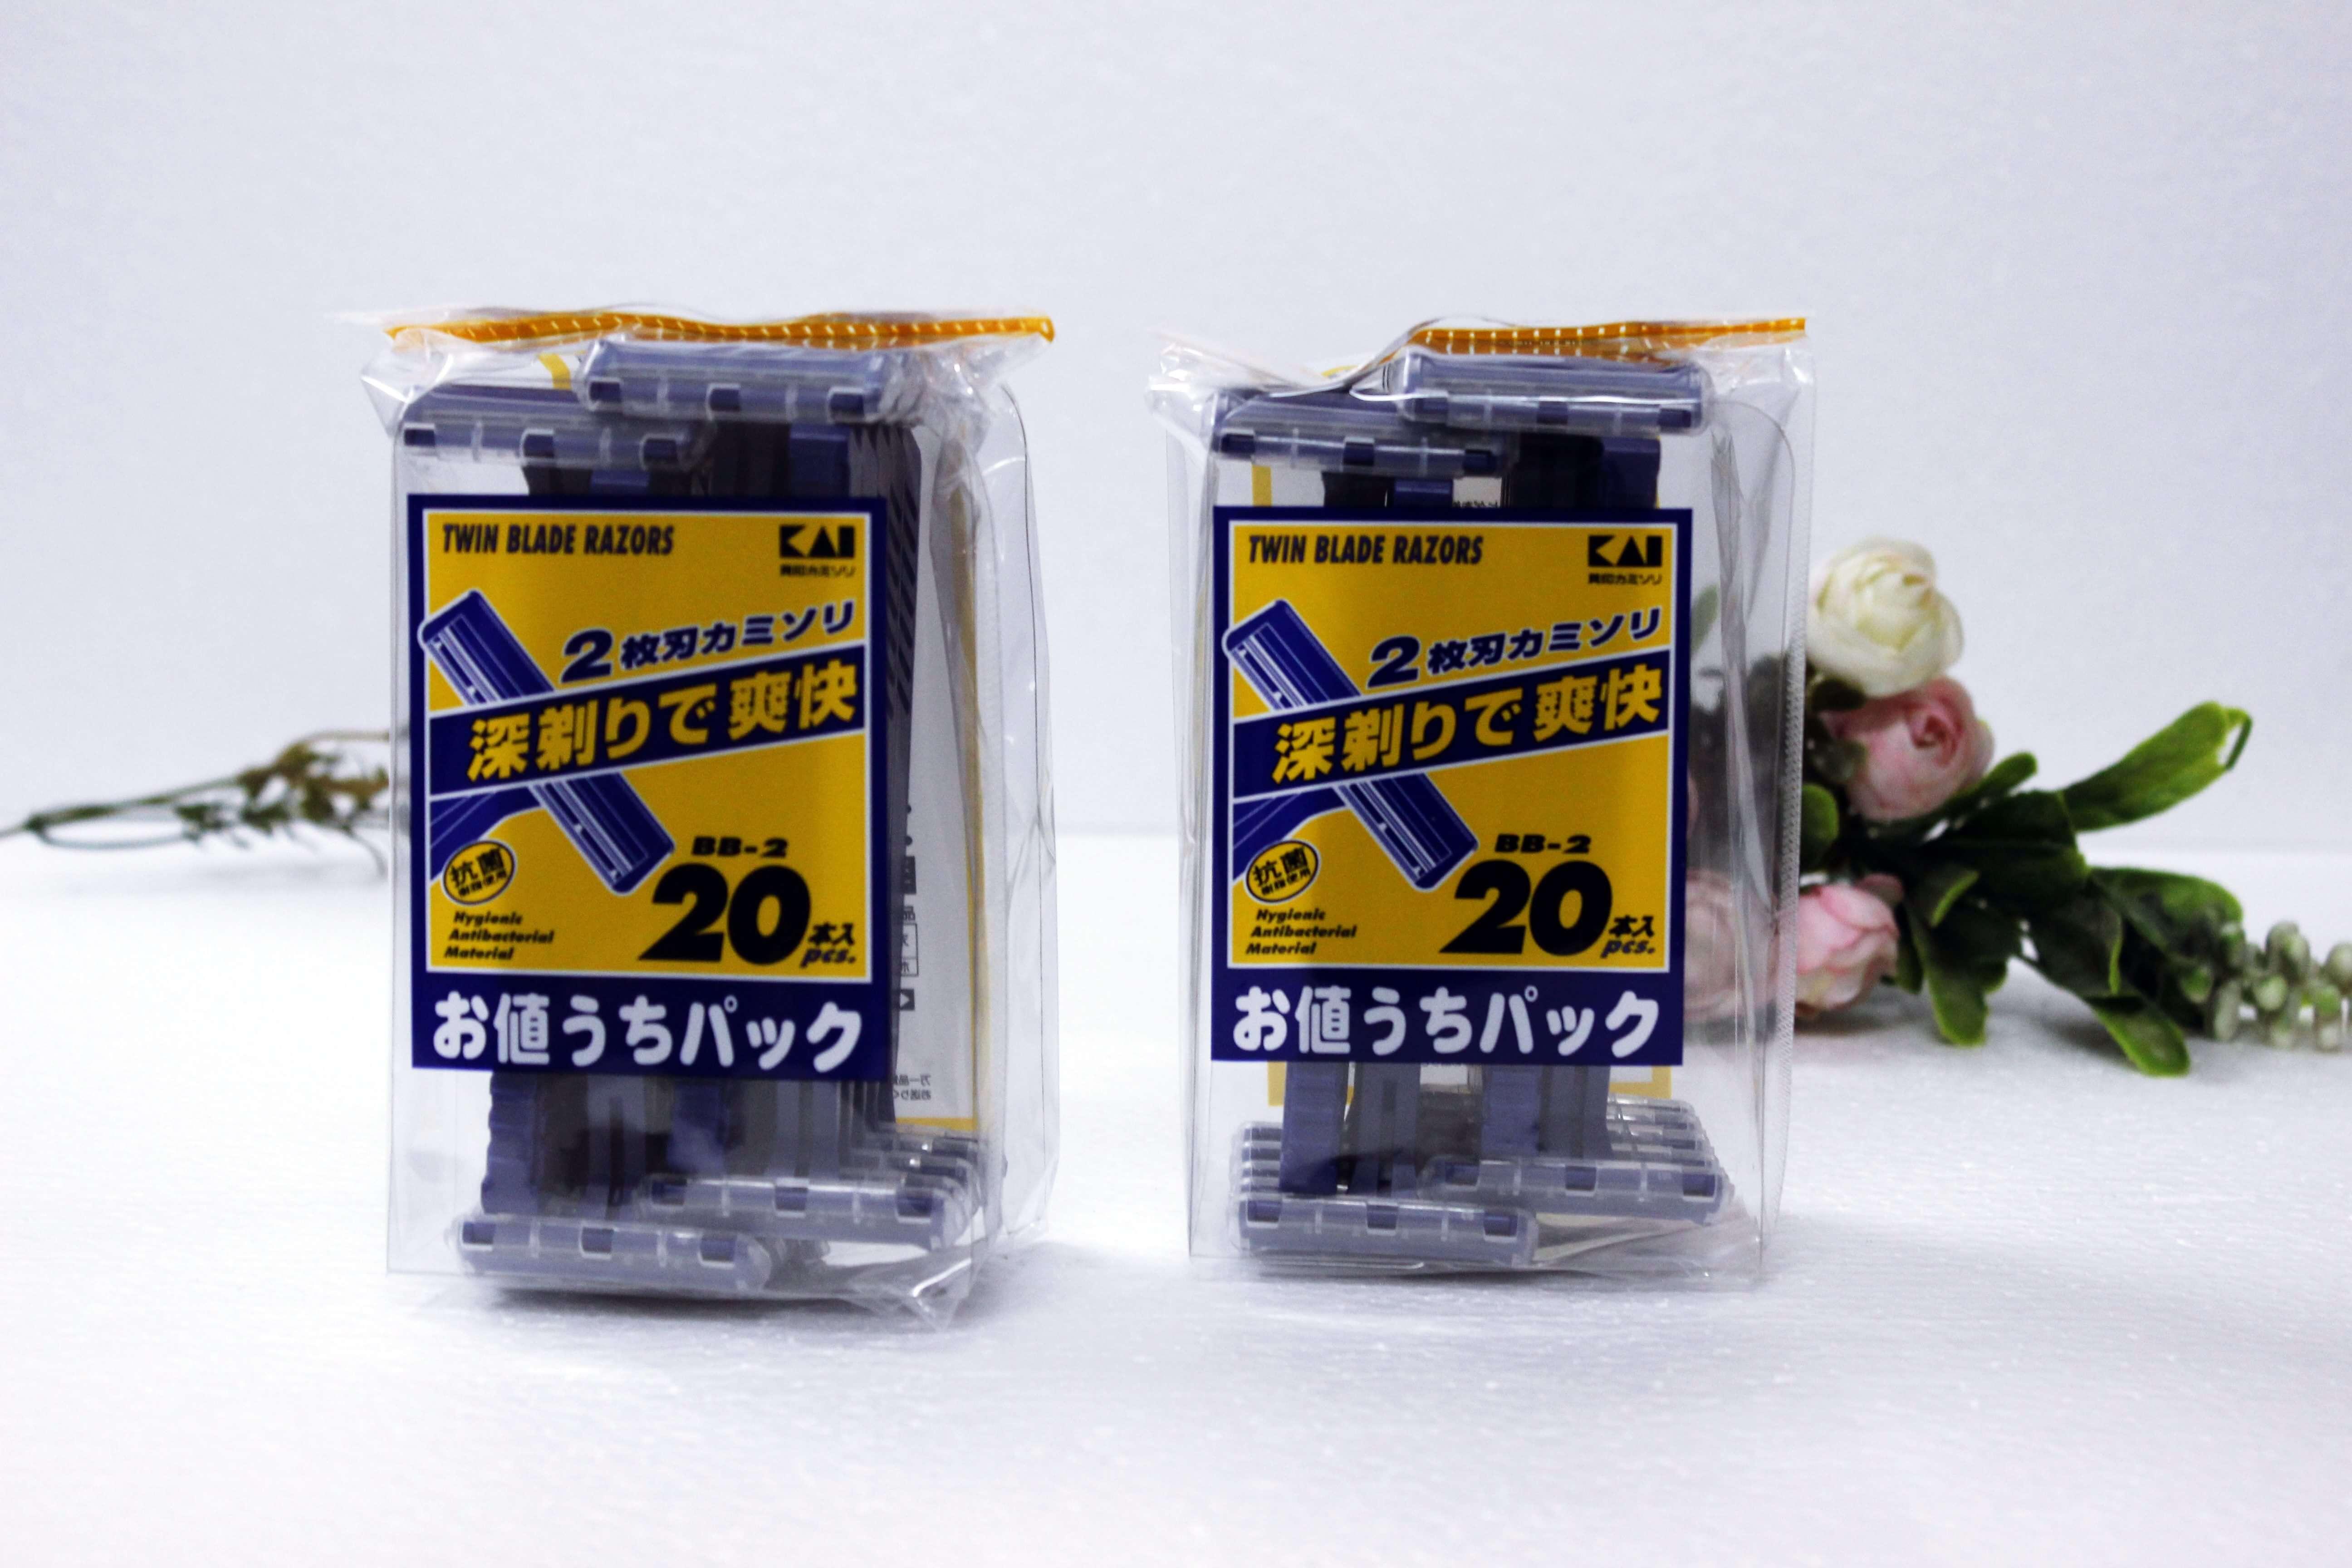 Set 20 dao cạo râu KAI Nhật Bản